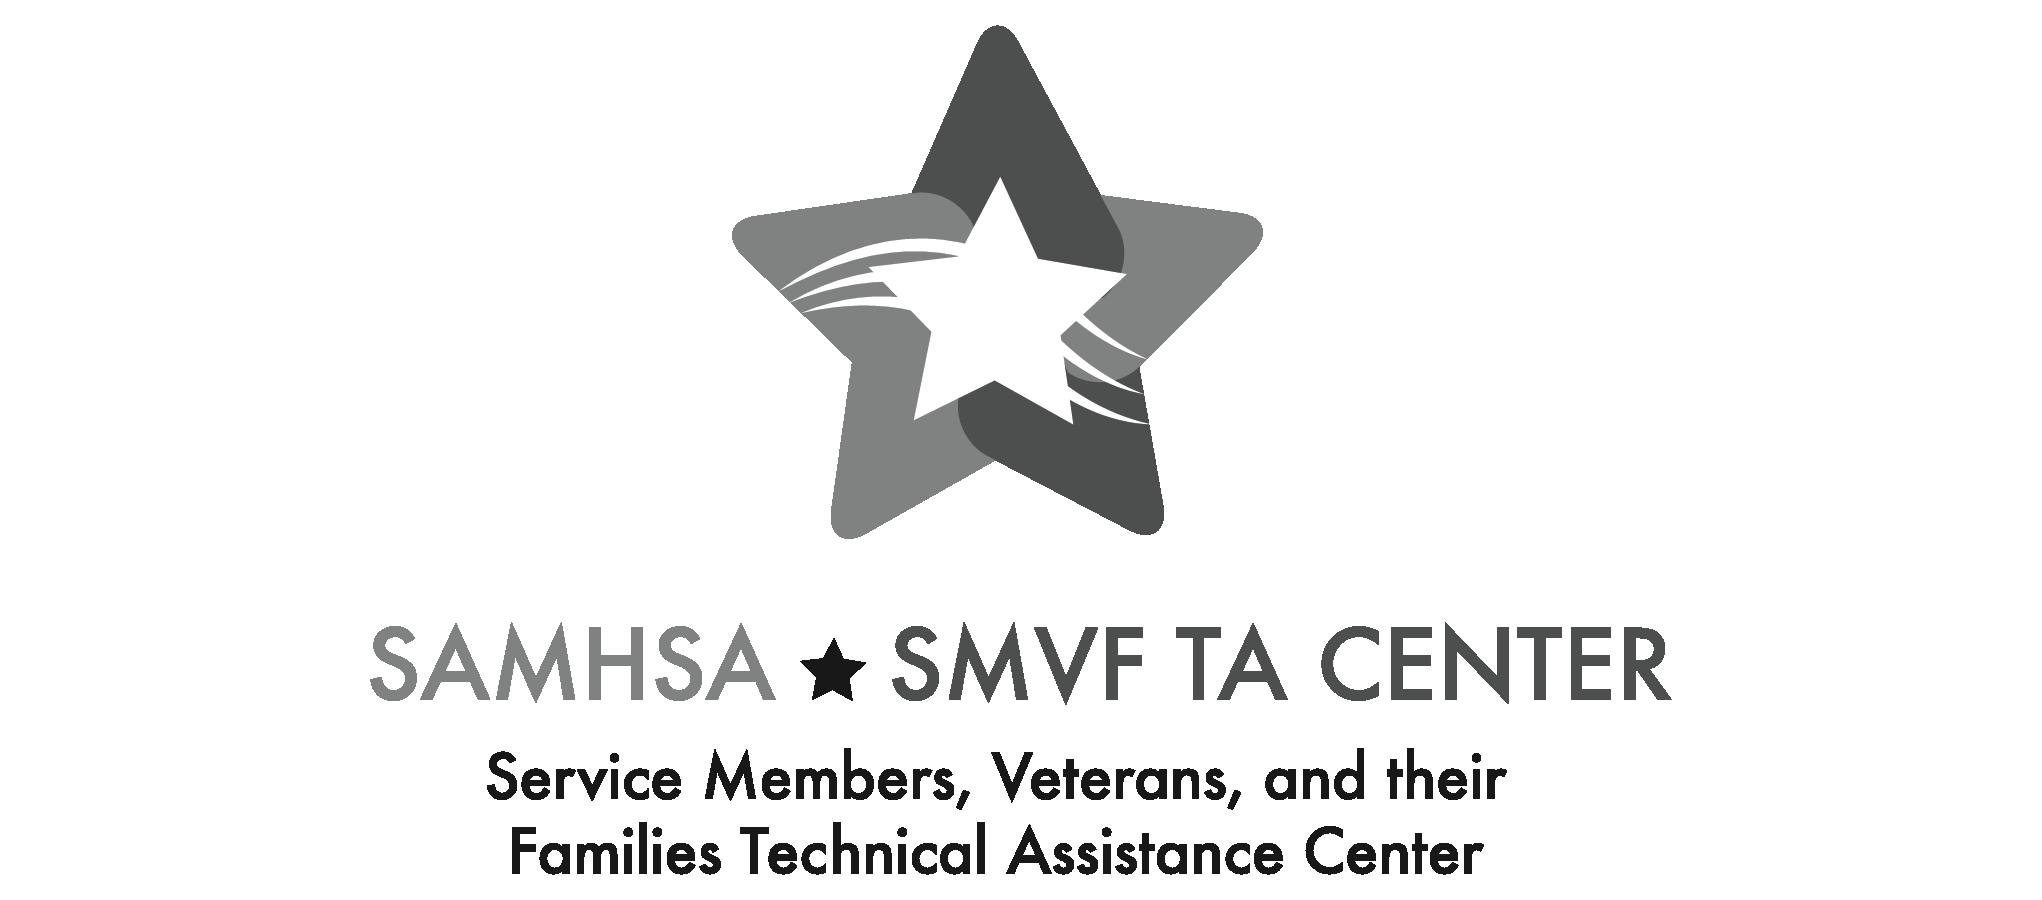 SMVF TA Center logo